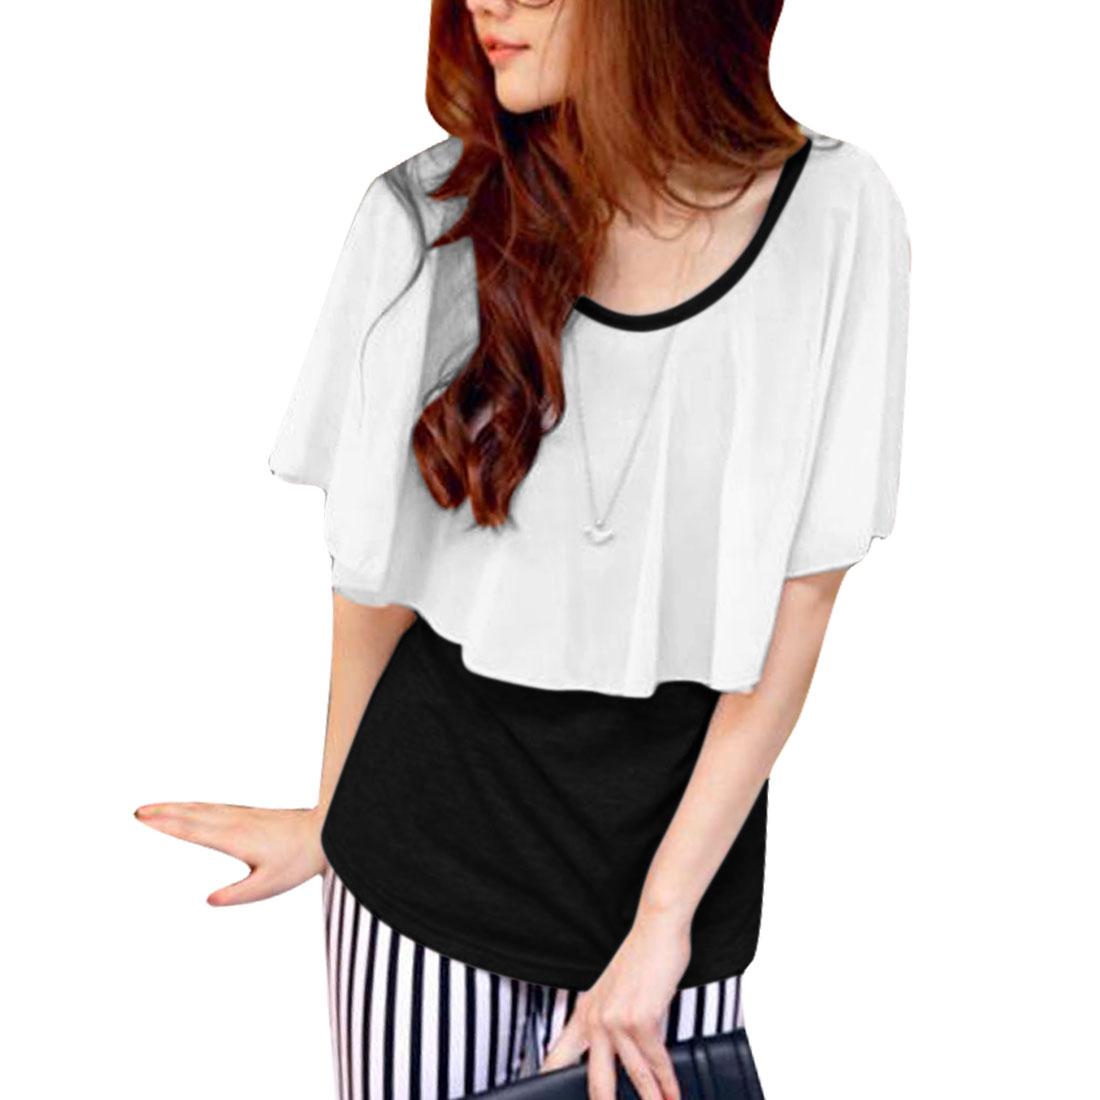 Ladies Round Neck Pullover Cape Design Blouse Black White XS